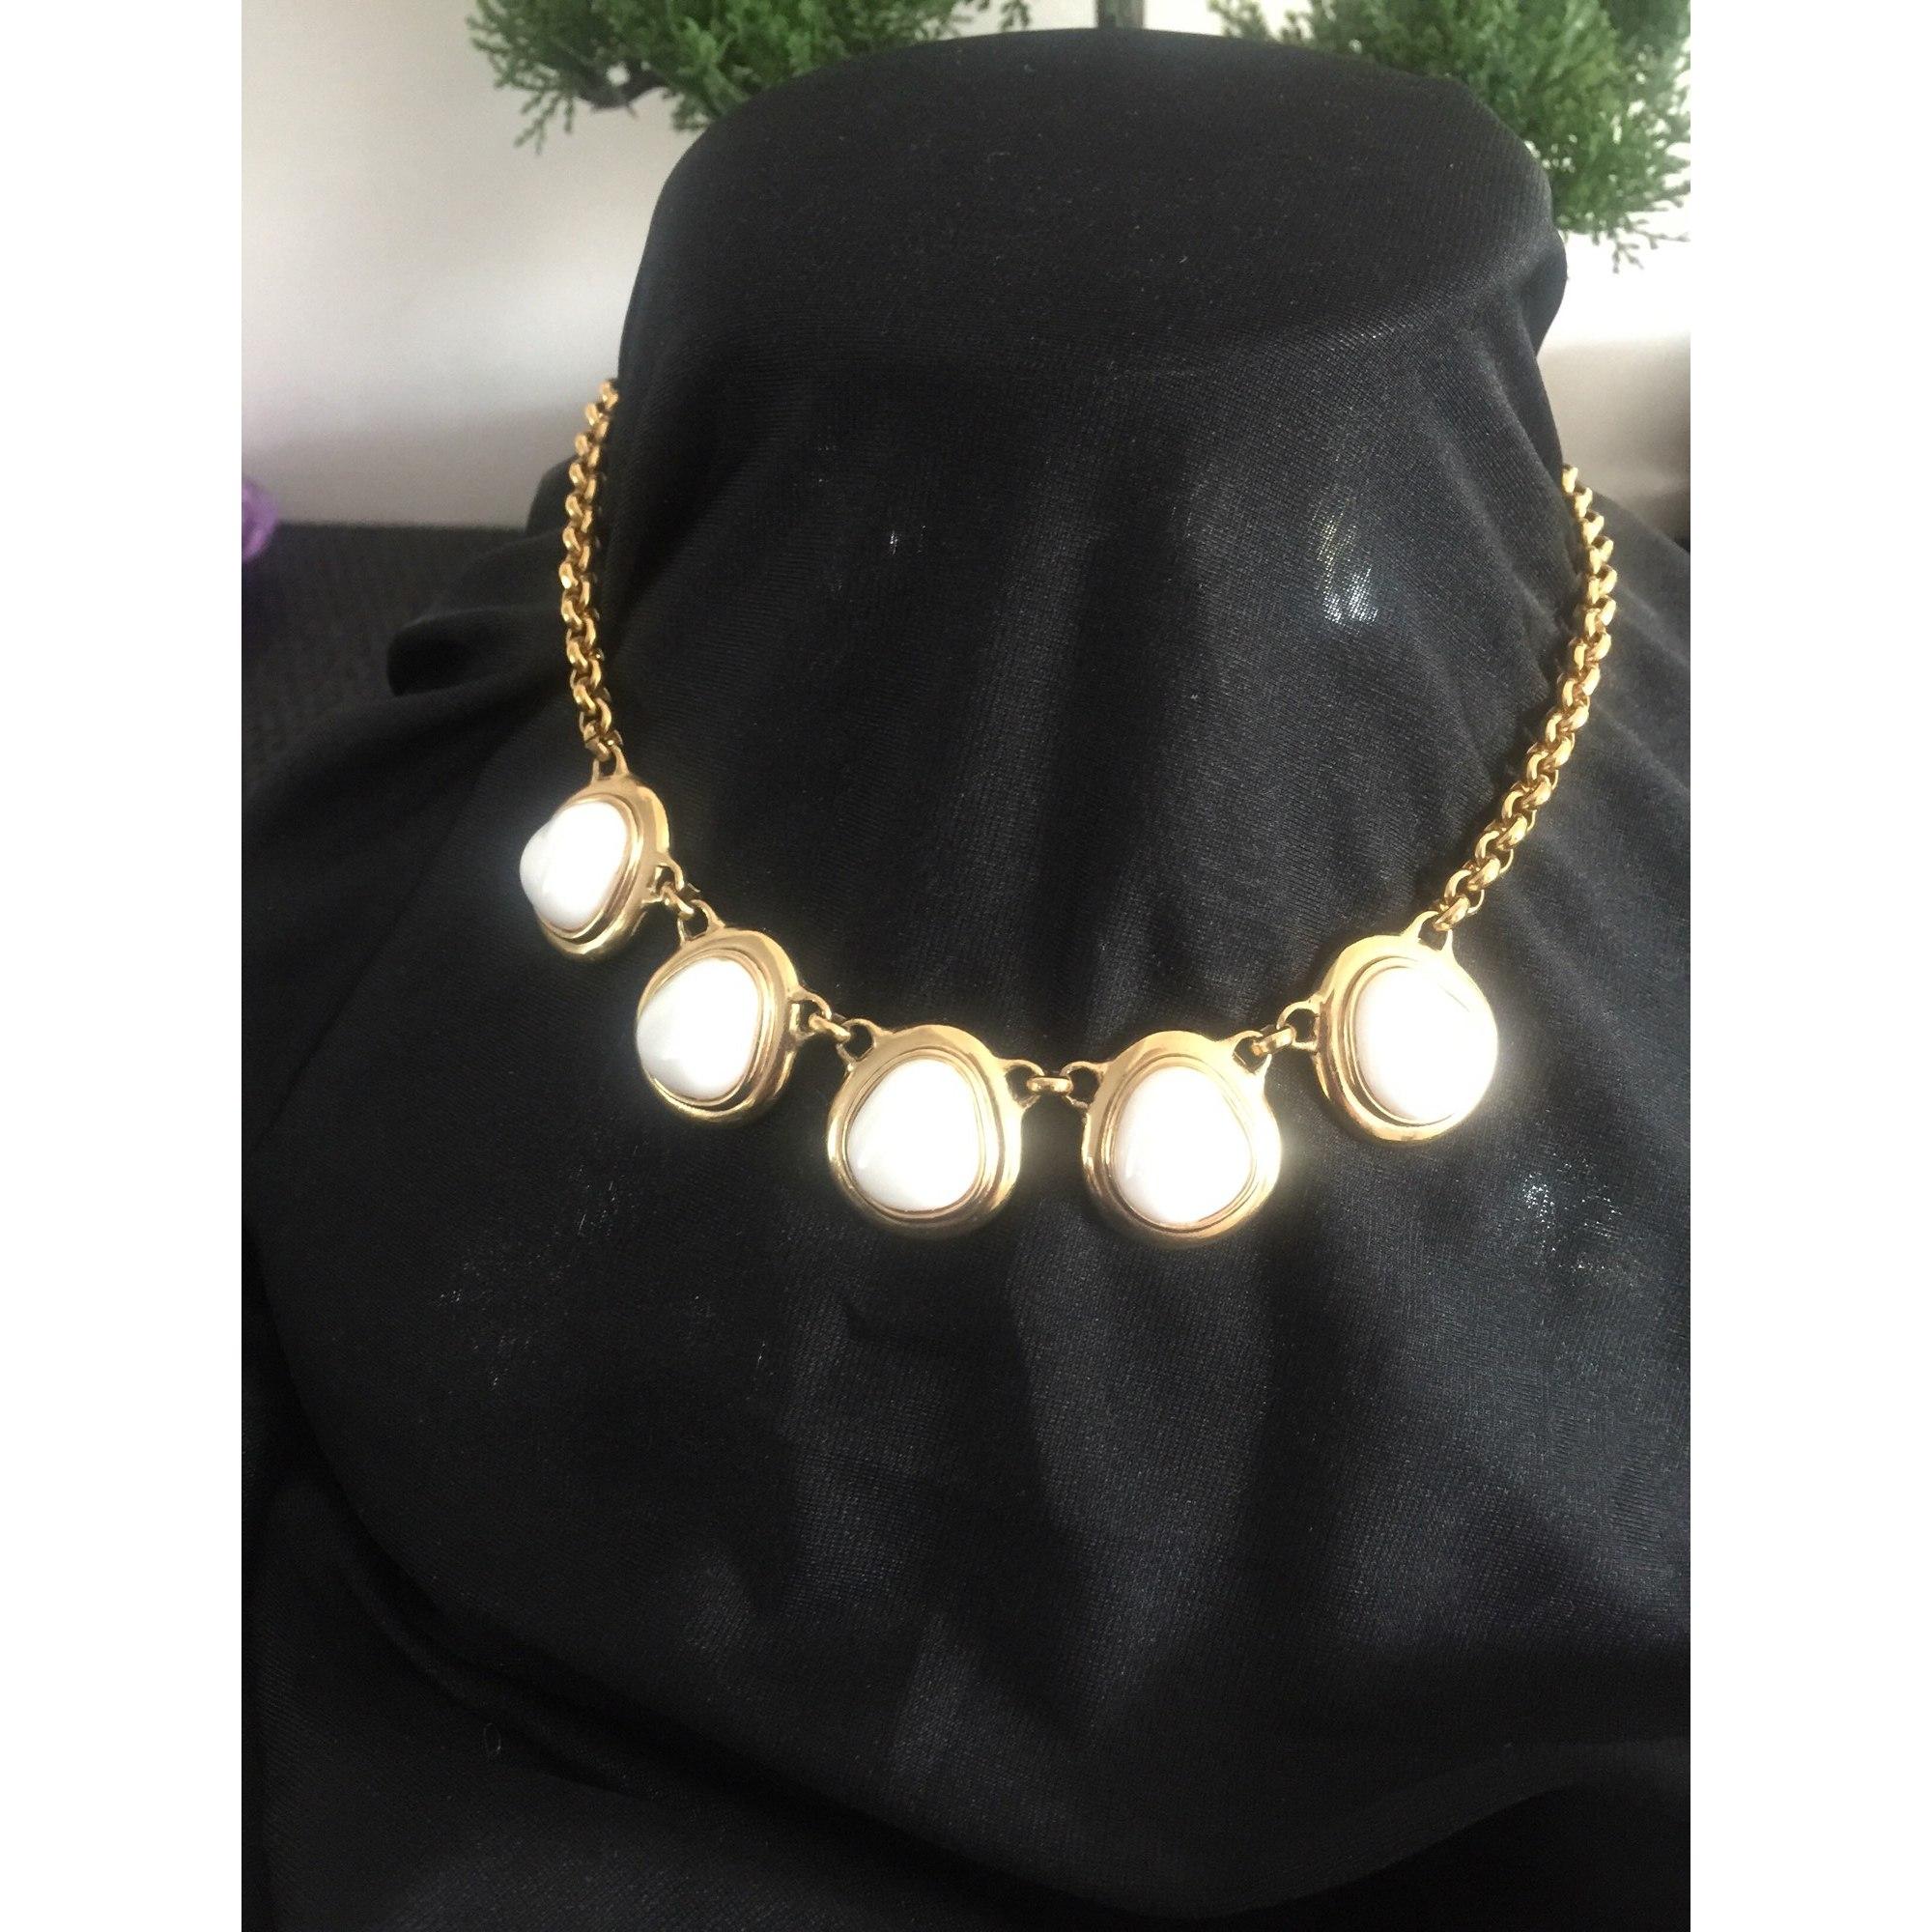 Pendentif, collier pendentif AGATHA Doré, bronze, cuivre